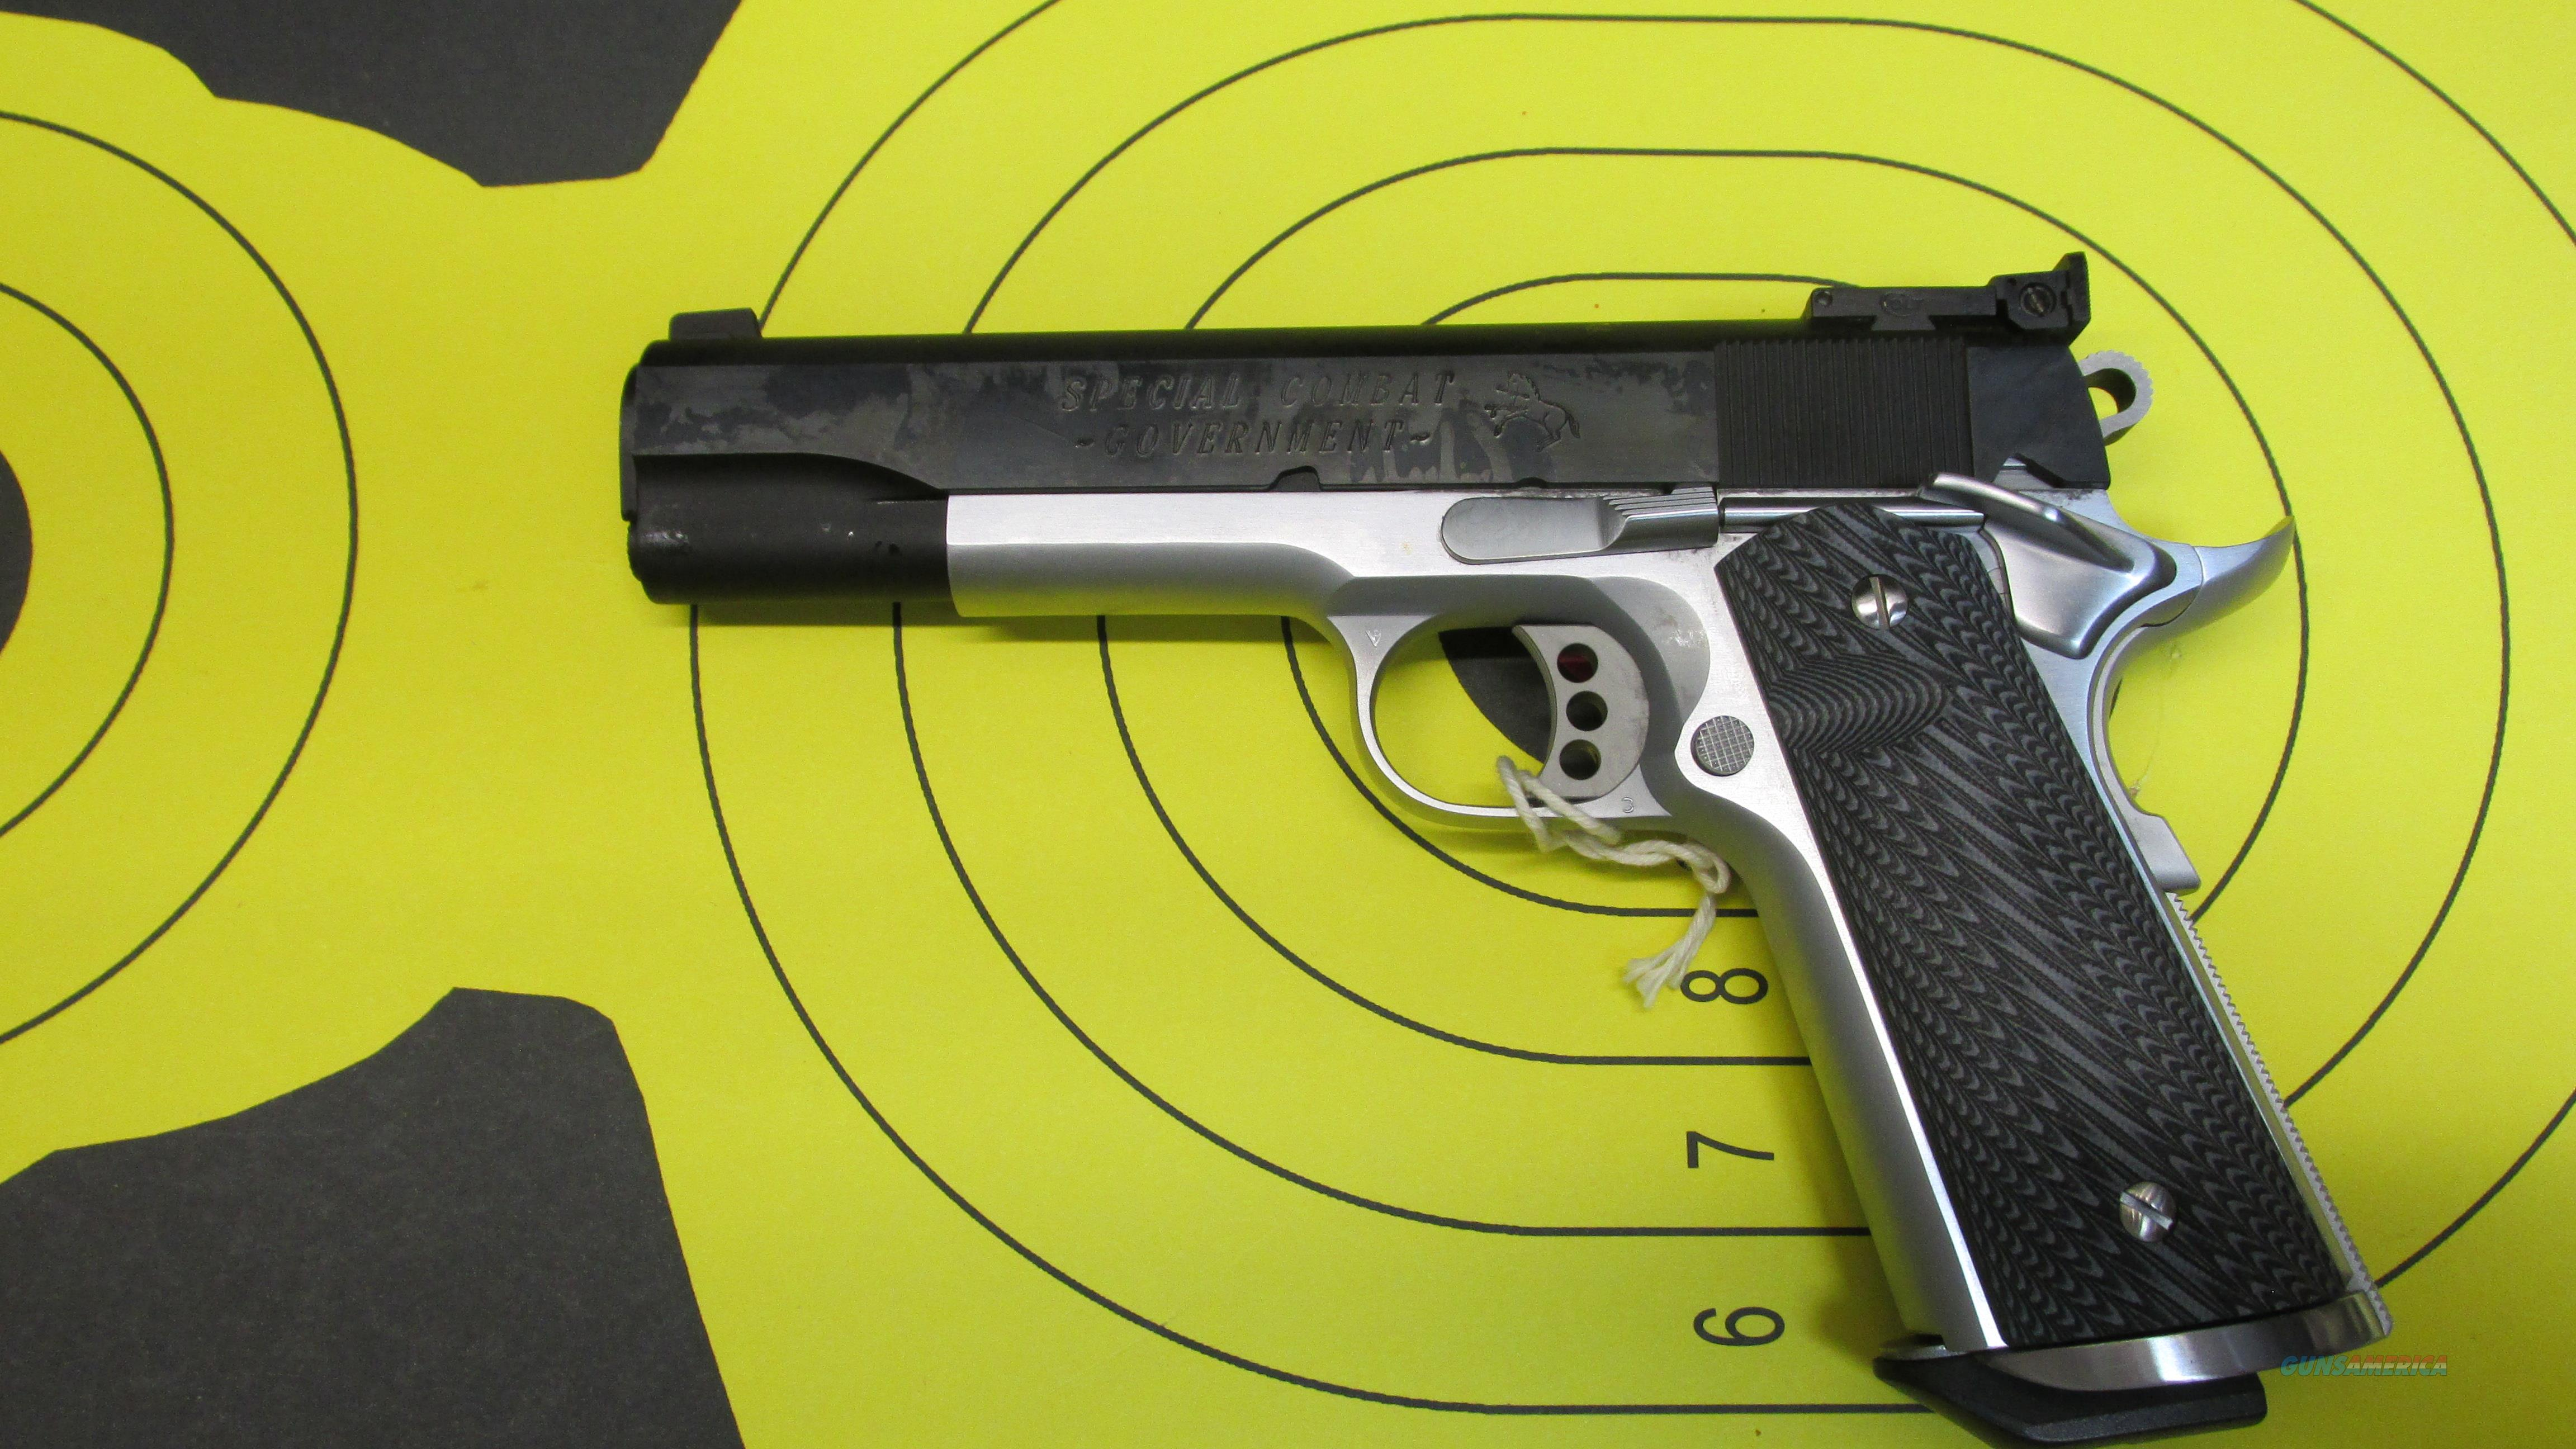 "COLT 1911 SPECIAL COMBAT COMPETITION 45ACP PISTOL 2 7 ROUND MAGAZINES WITH 5"" BARREL  Guns > Pistols > Colt Automatic Pistols (1911 & Var)"